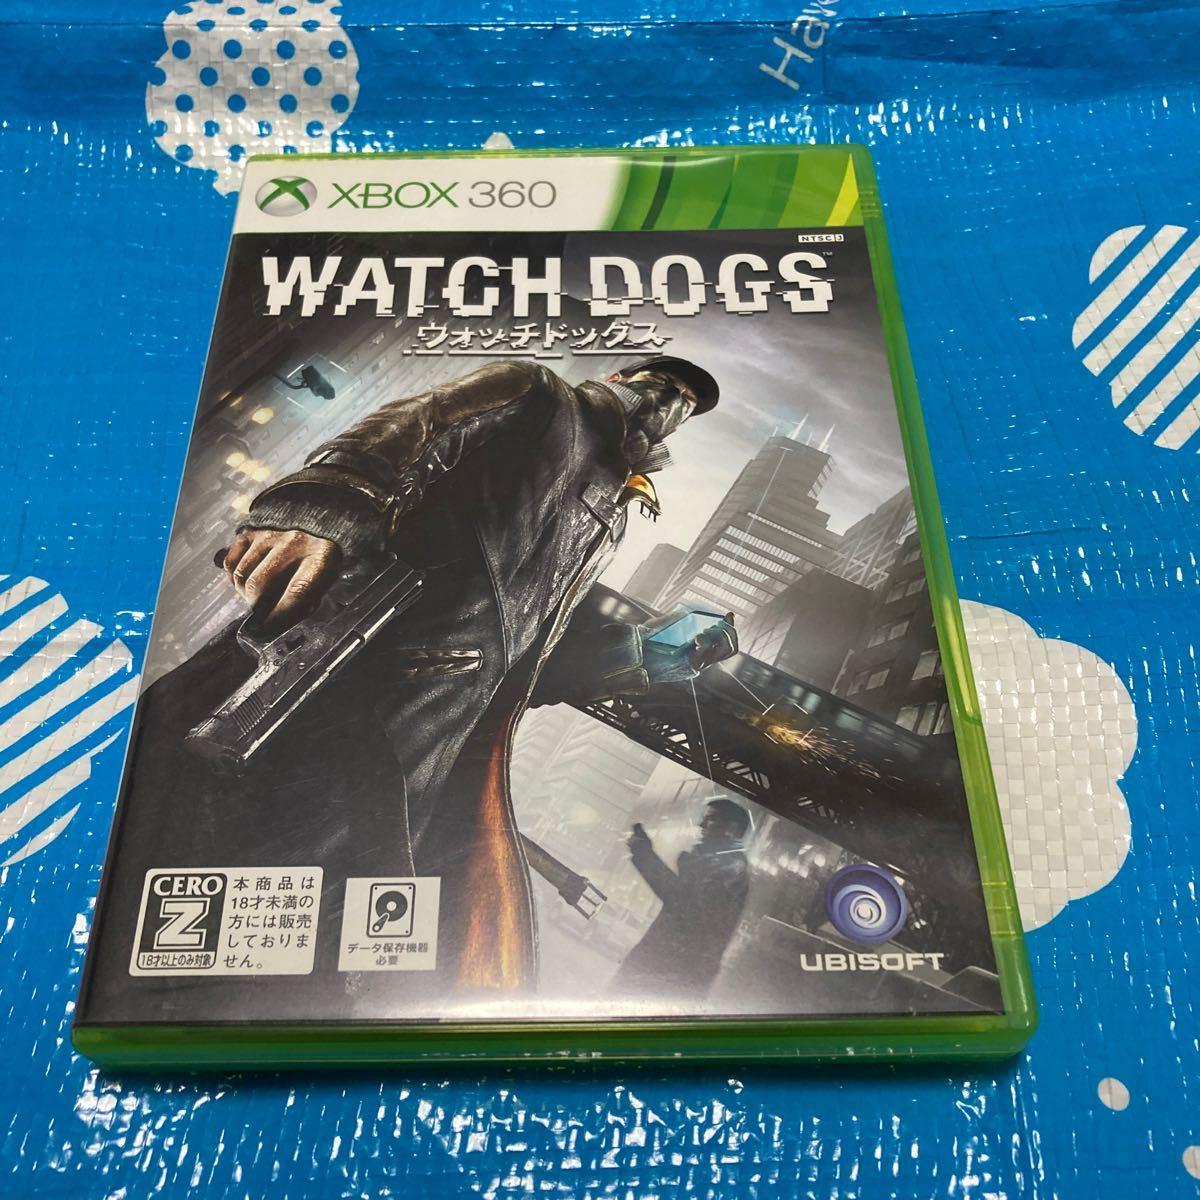 【Xbox360】 ウォッチドッグス (WATCH DOGS)